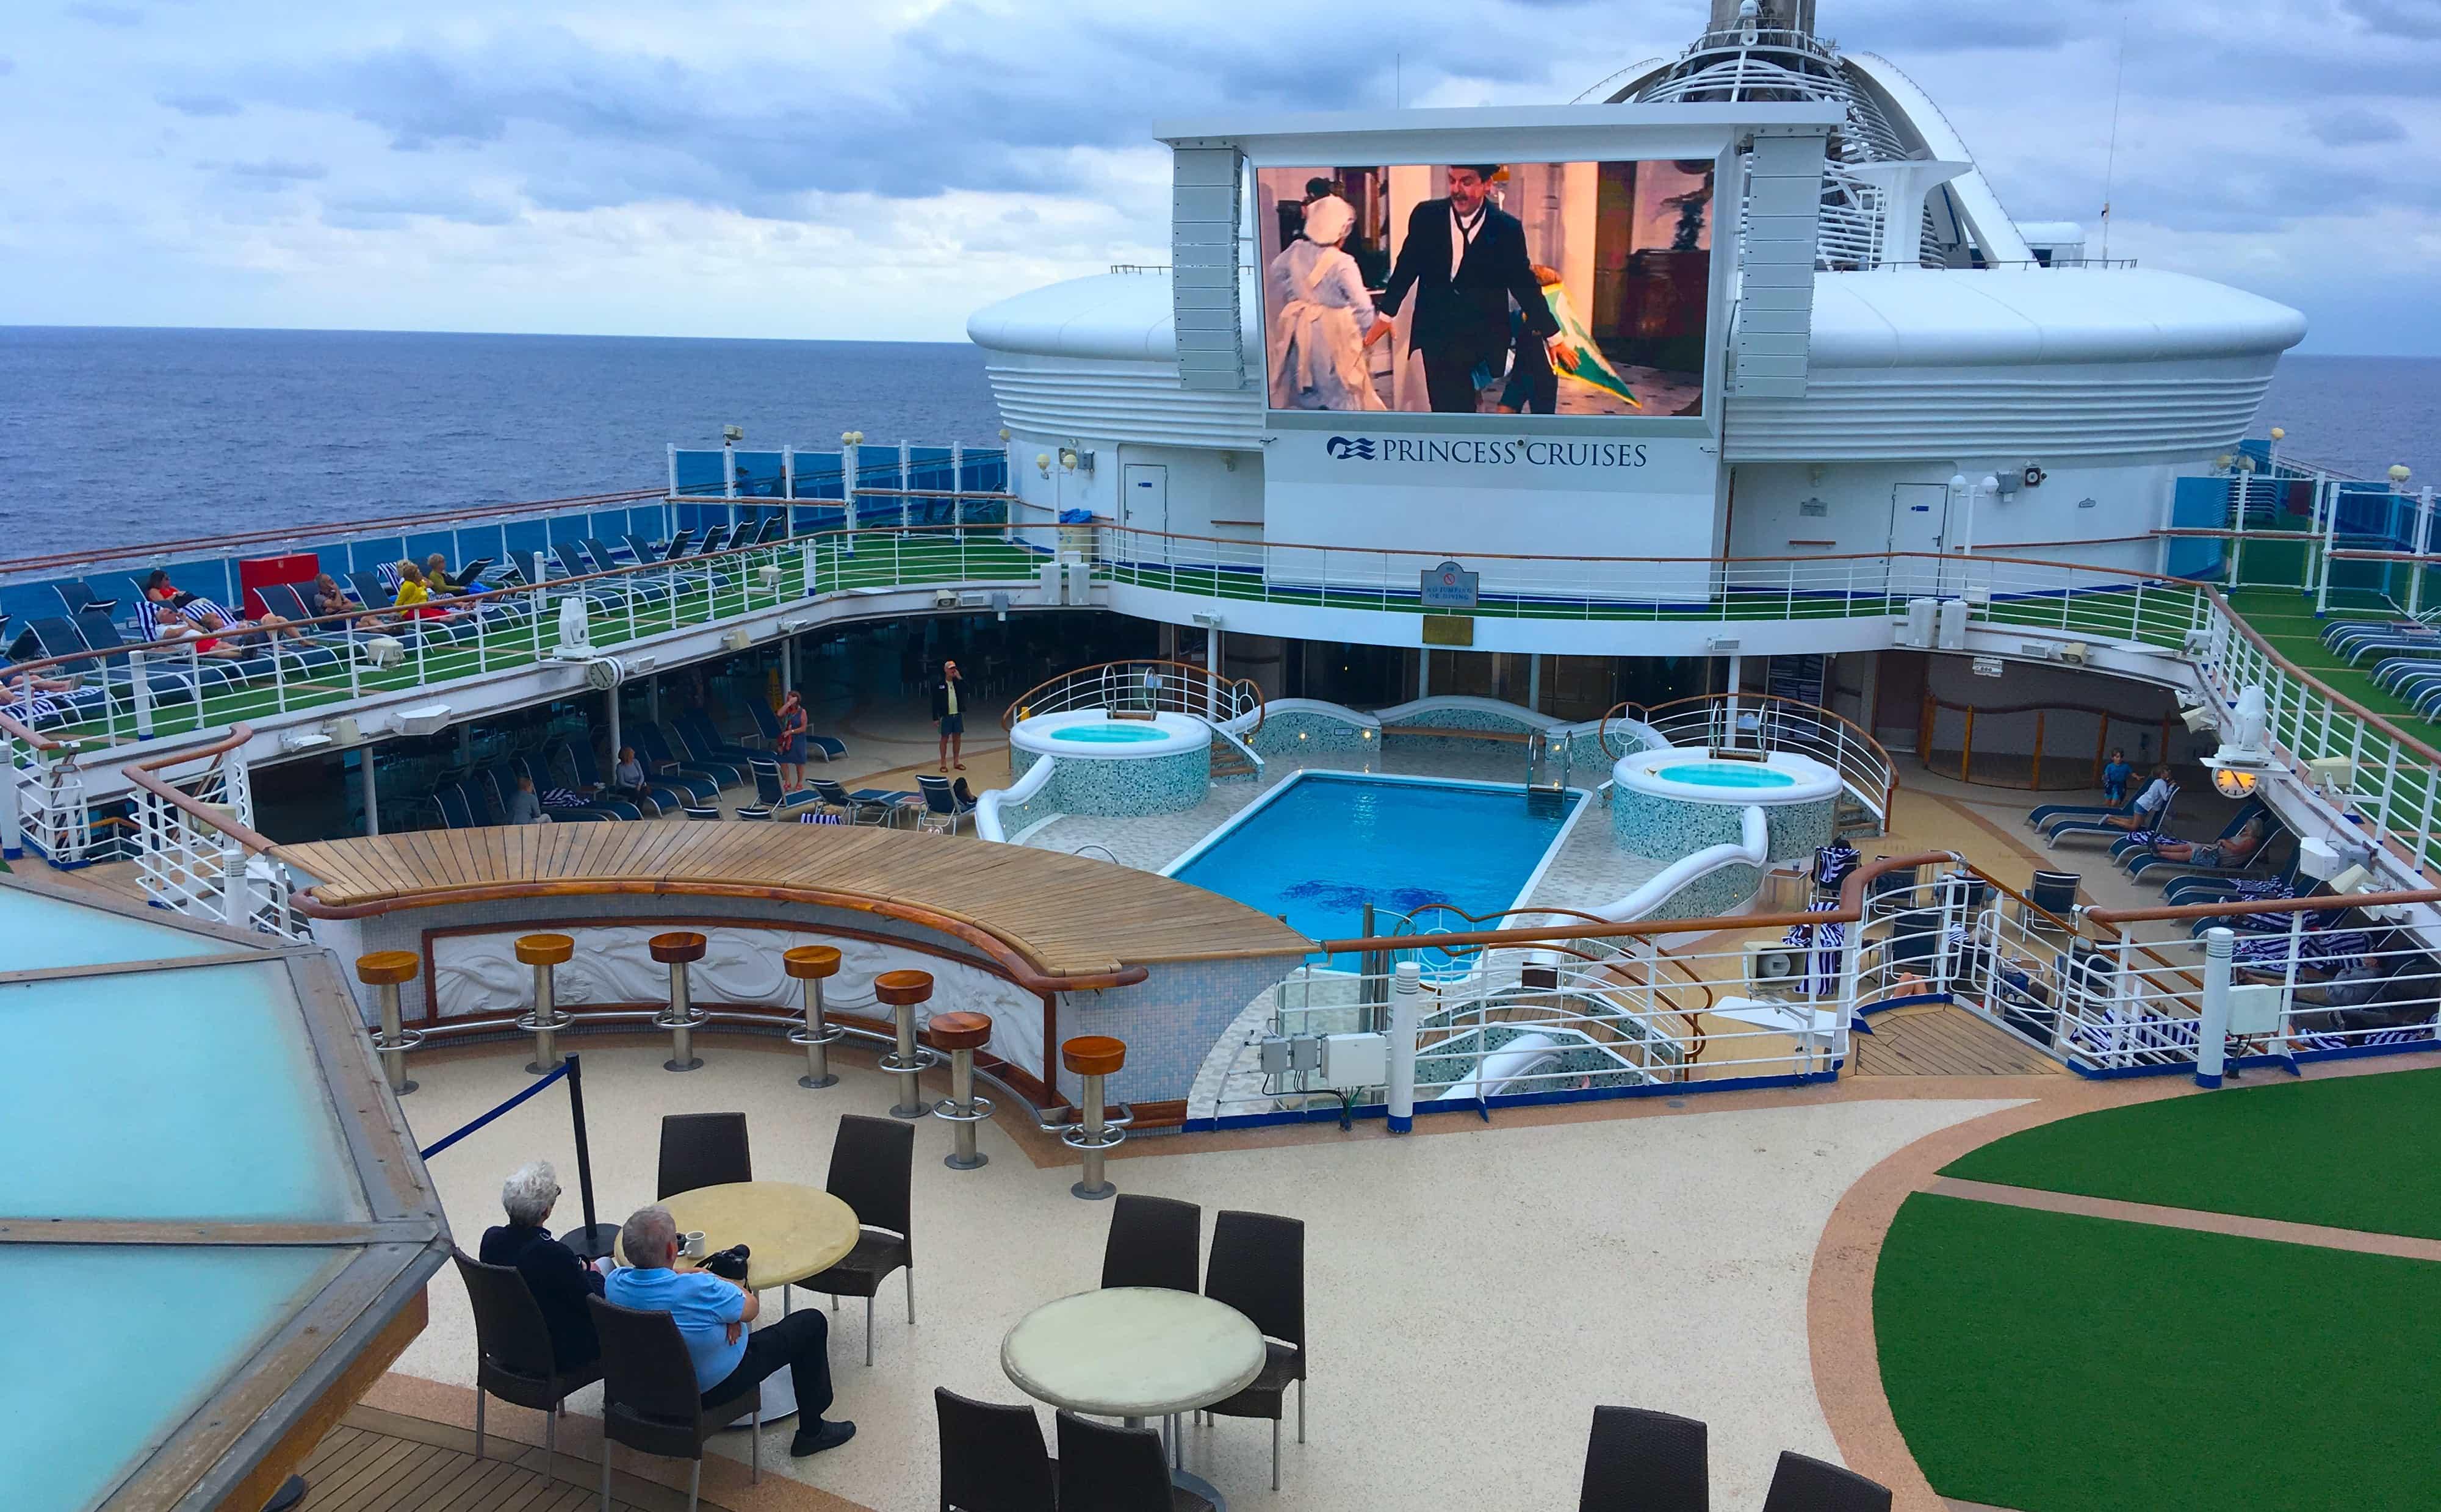 golden princess top deck swimming pools movies under the stars saving mr banks